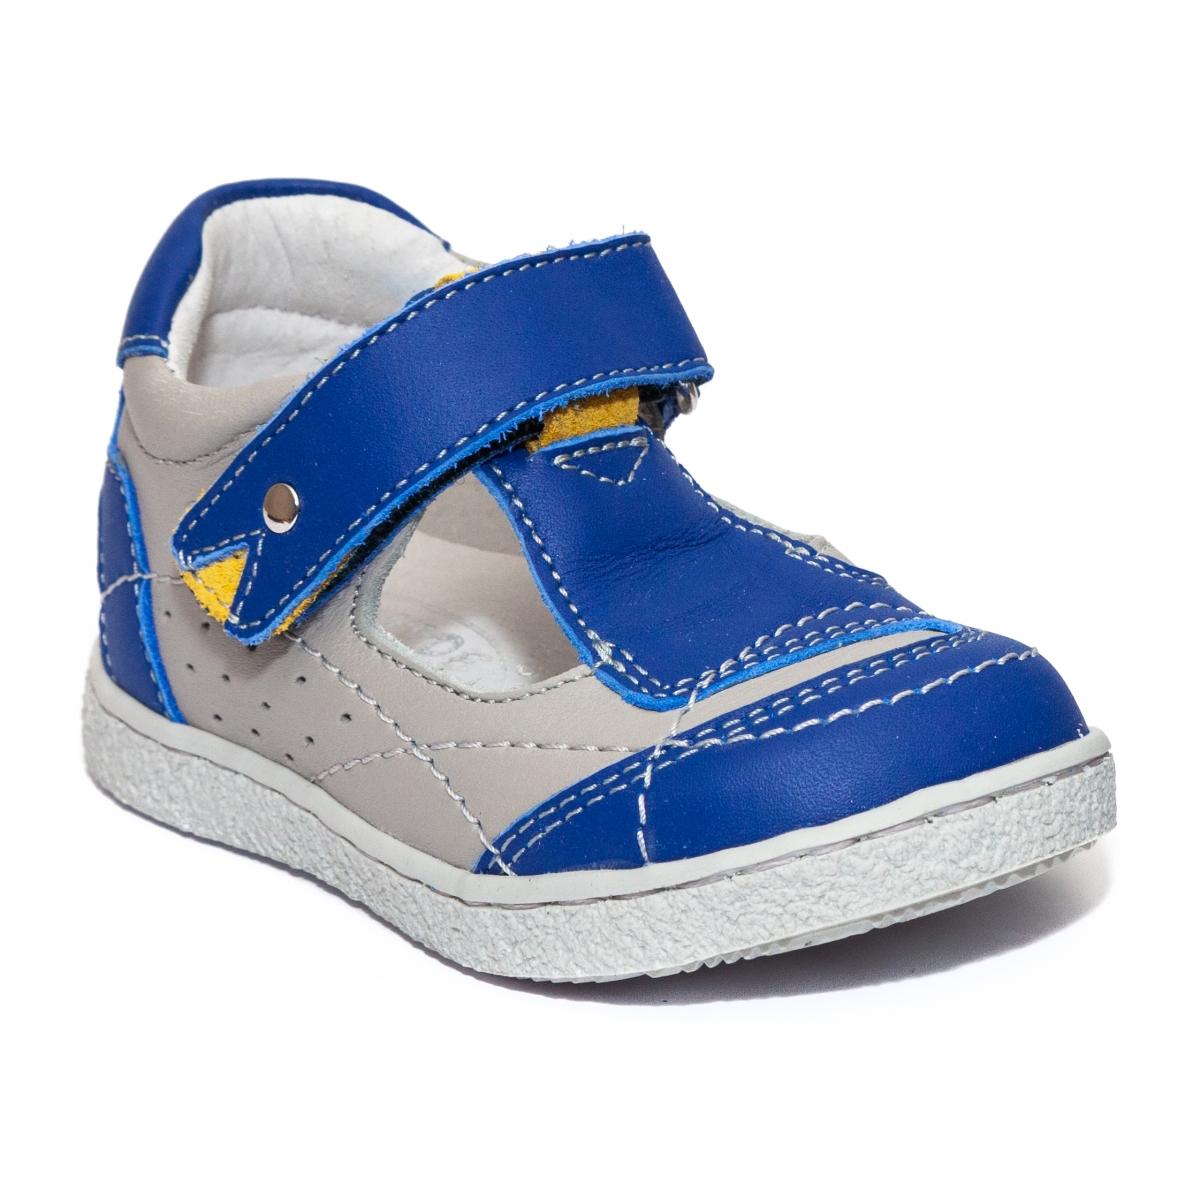 Sandalute baietei hokide 208 albastru gri 18-24